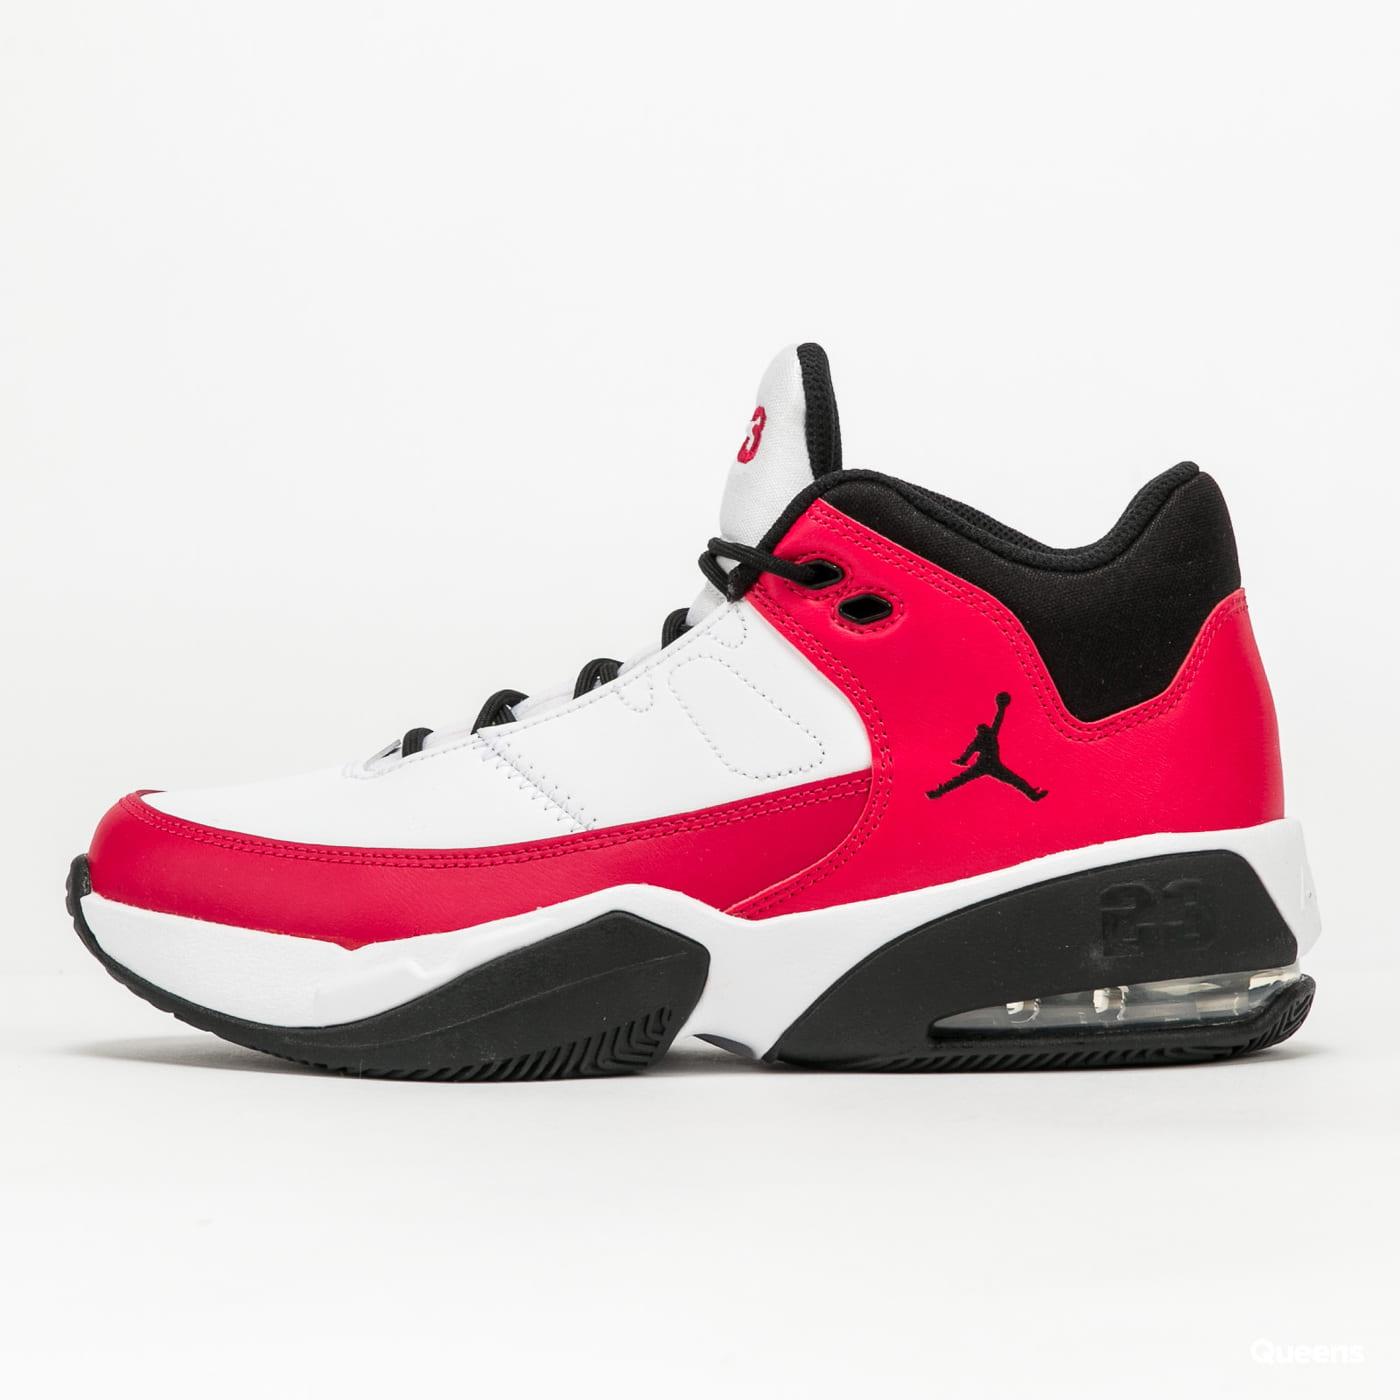 Jordan Max Aura 3 (GS) white / very berry - black